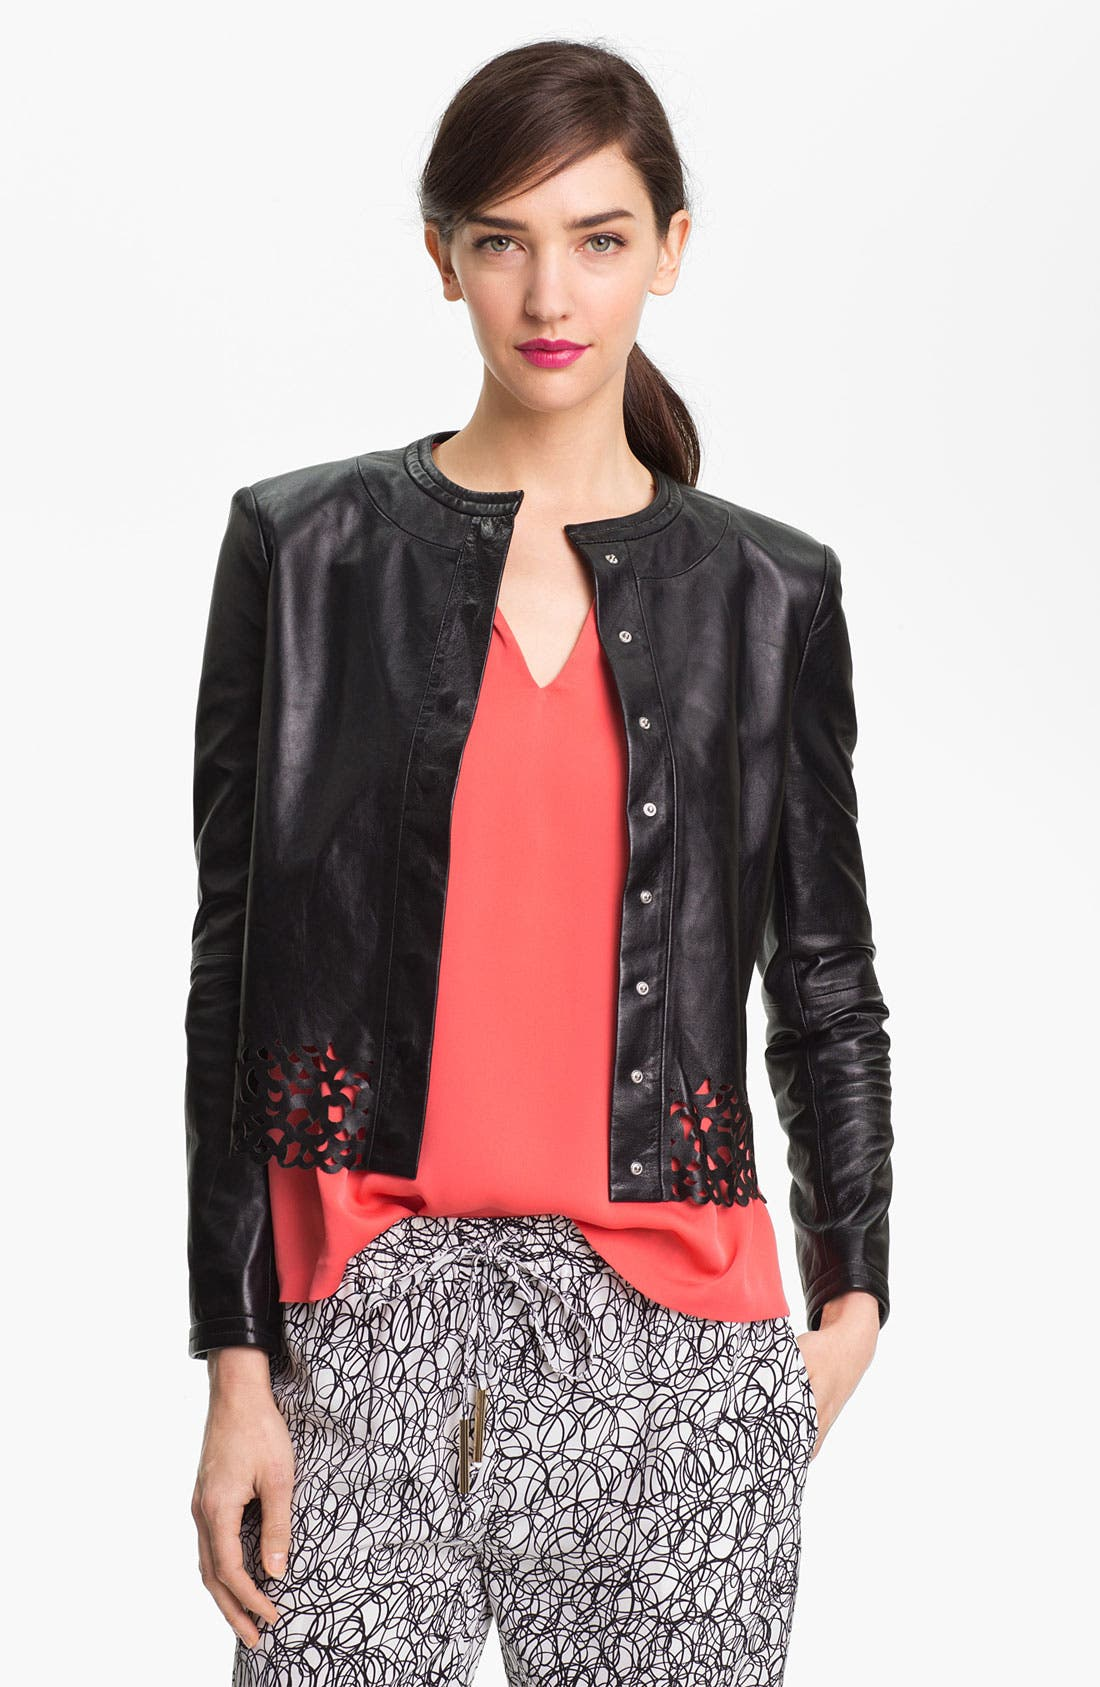 Alternate Image 1 Selected - Diane von Furstenberg 'Merryl' Crop Leather Jacket